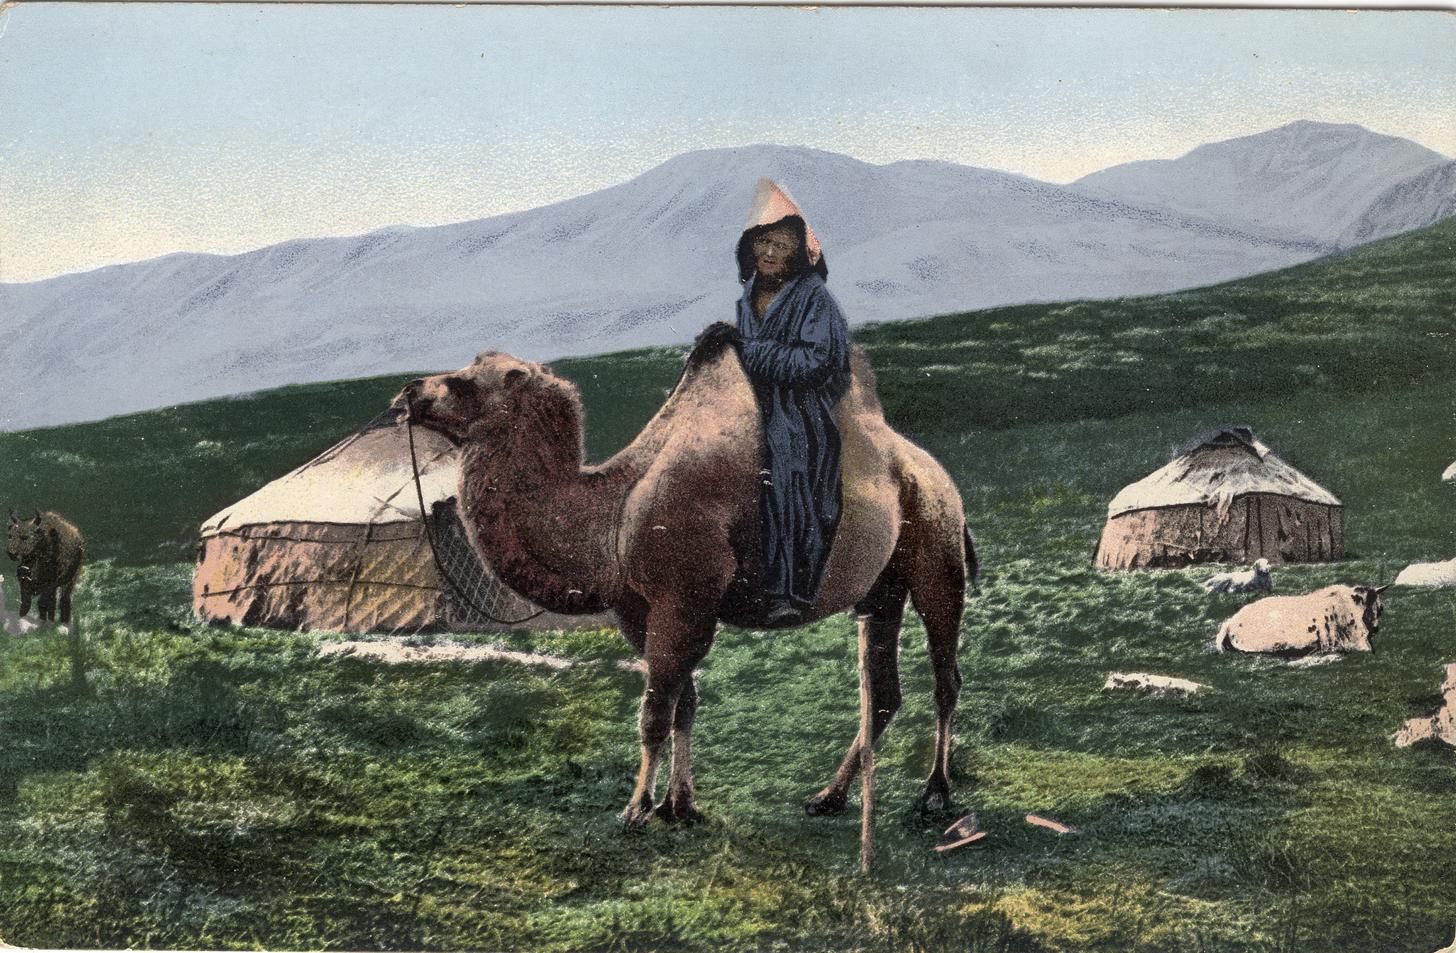 Казах на верблюде на фоне юрт. Долина реки Аракан, притока Черной Берели